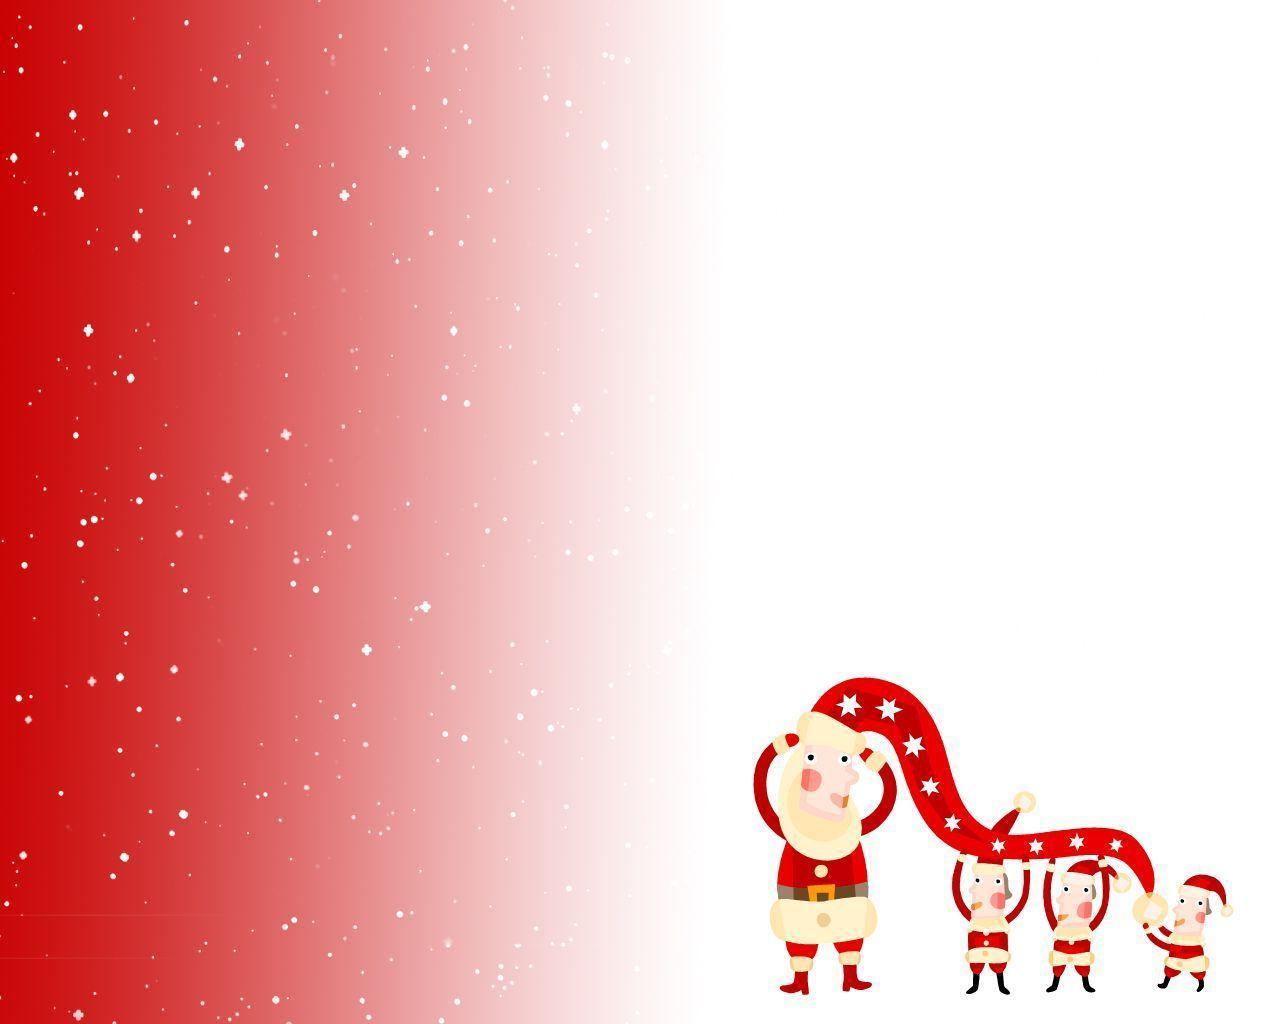 Cute Christmas Desktop Backgrounds - Wallpaper Cave